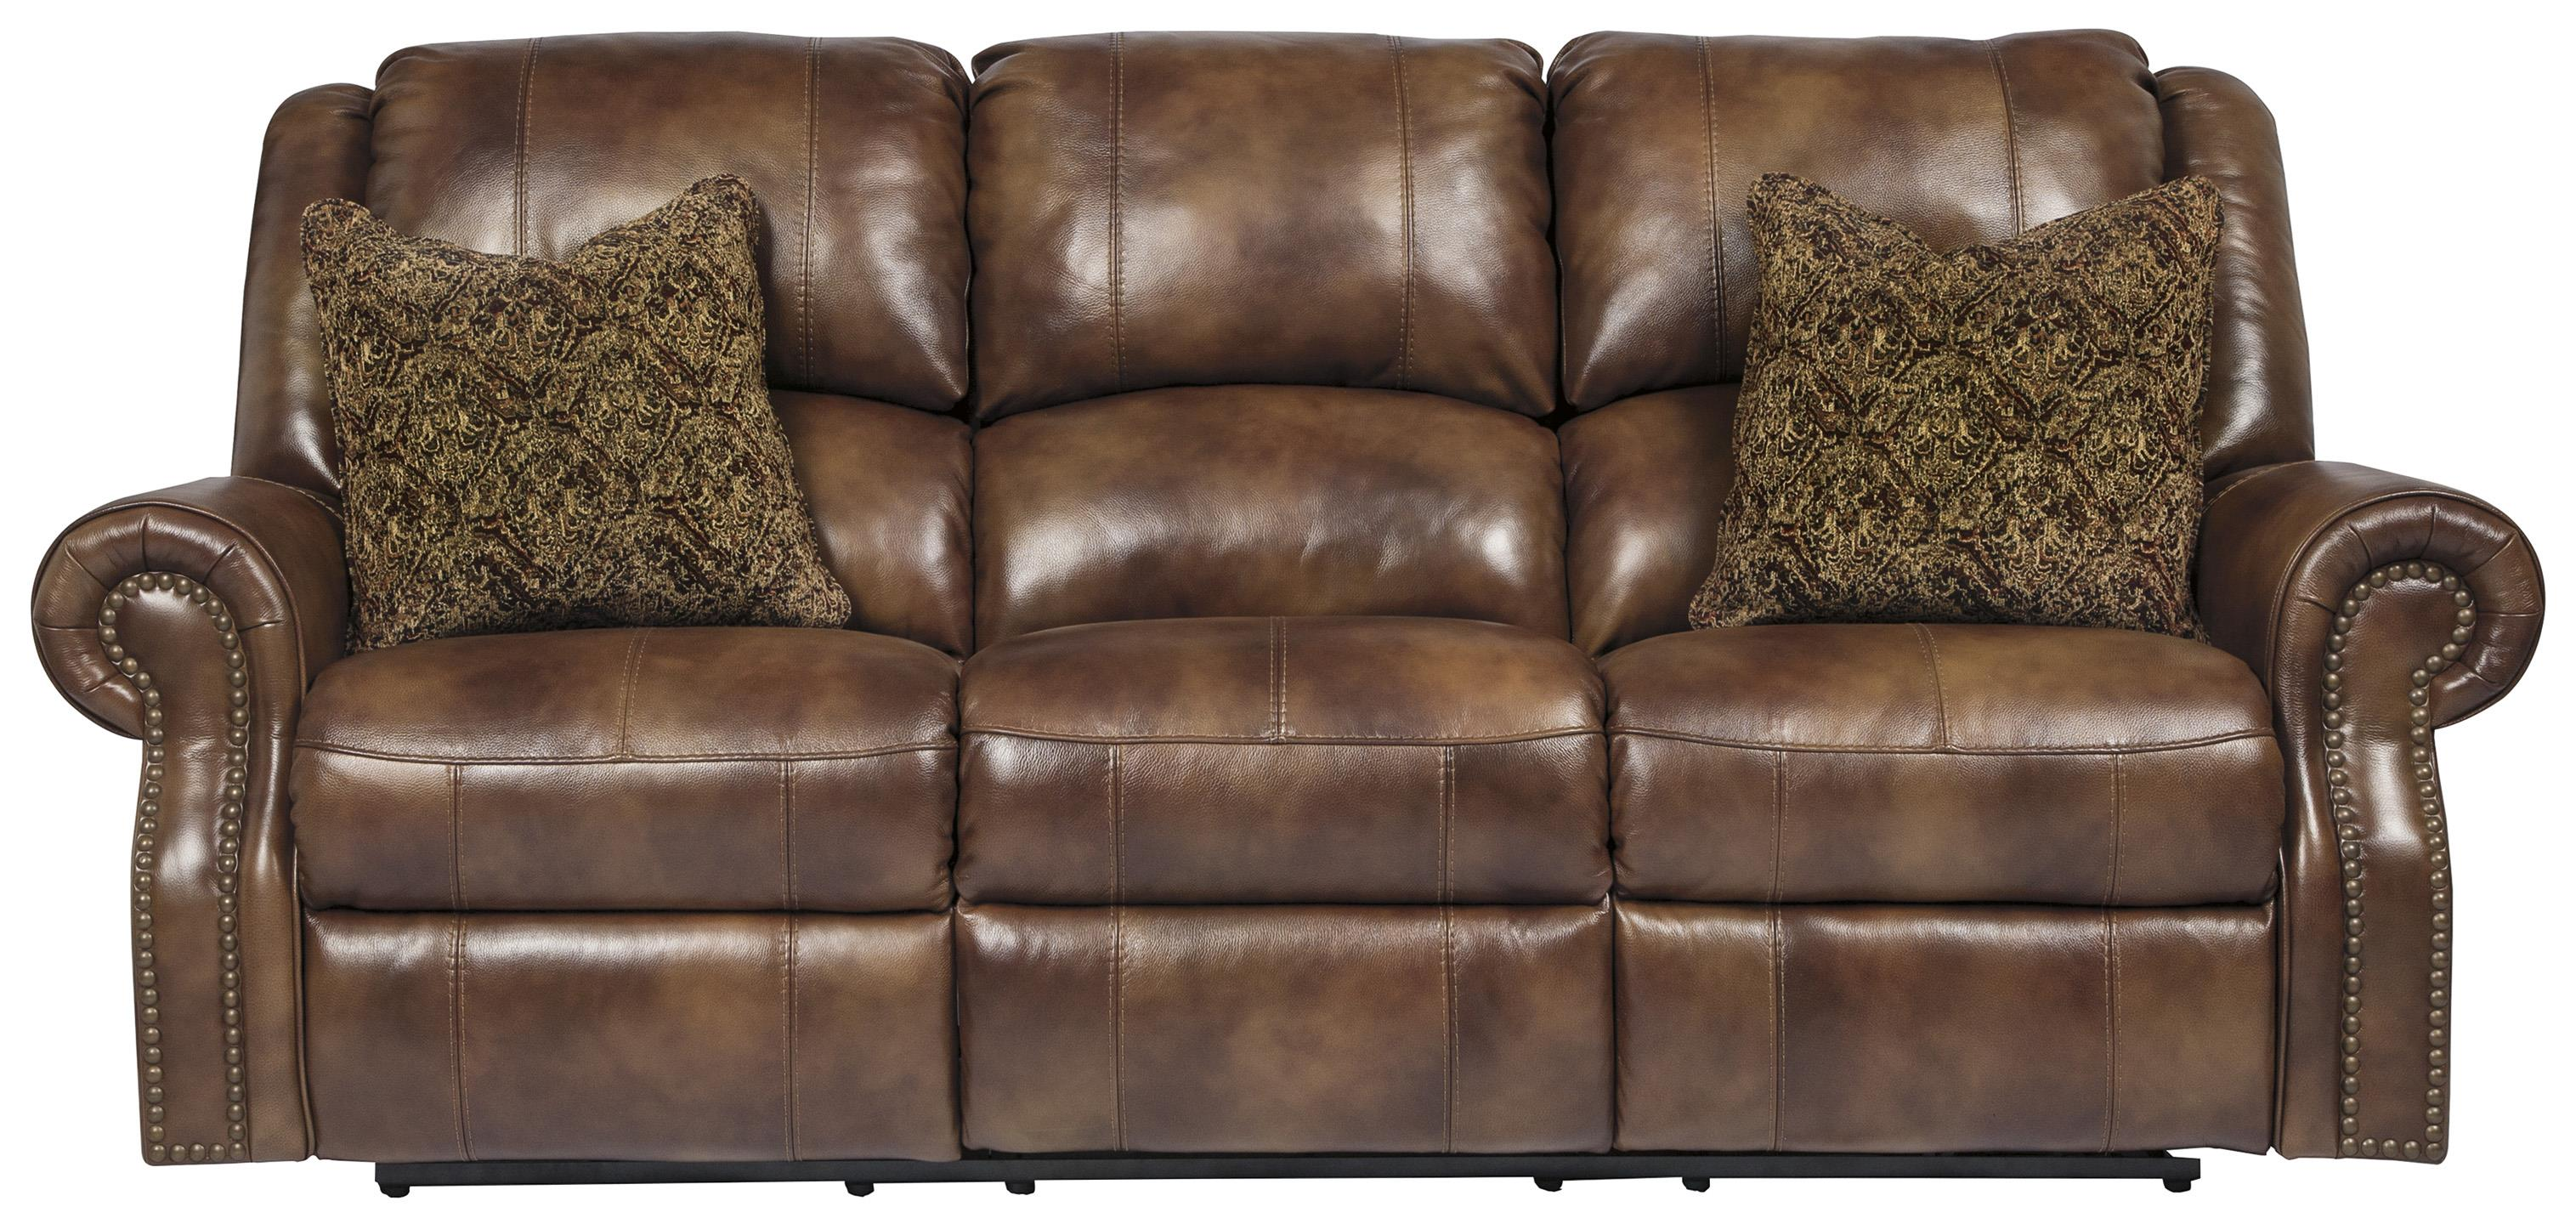 Signature Design by Ashley Walworth Reclining Power Sofa - Item Number: U7800187